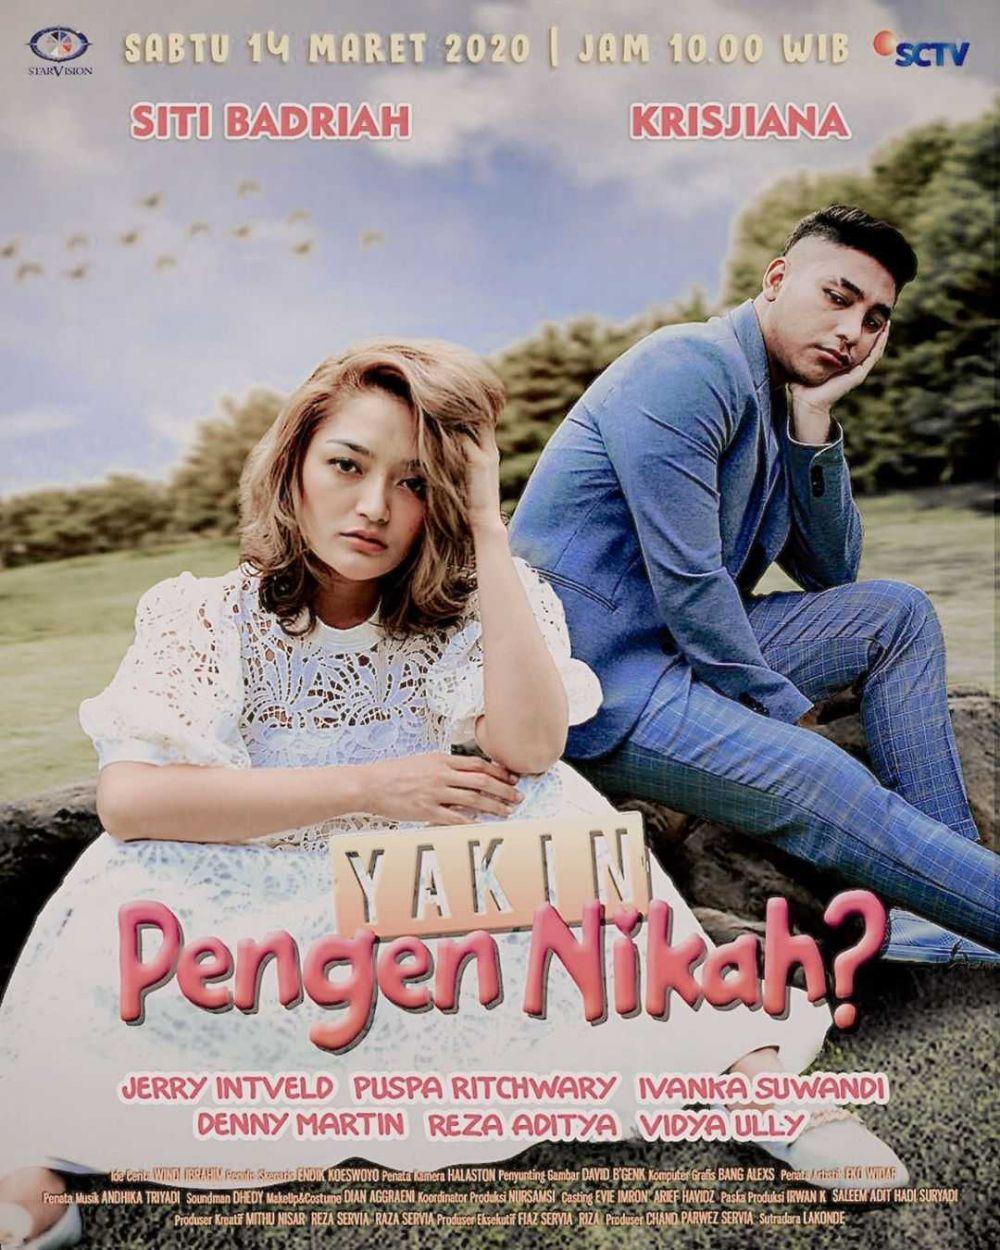 Nikah Rasa Pacaran, 10 Potret Siti Badriah dan Suami yang Bikin Baper